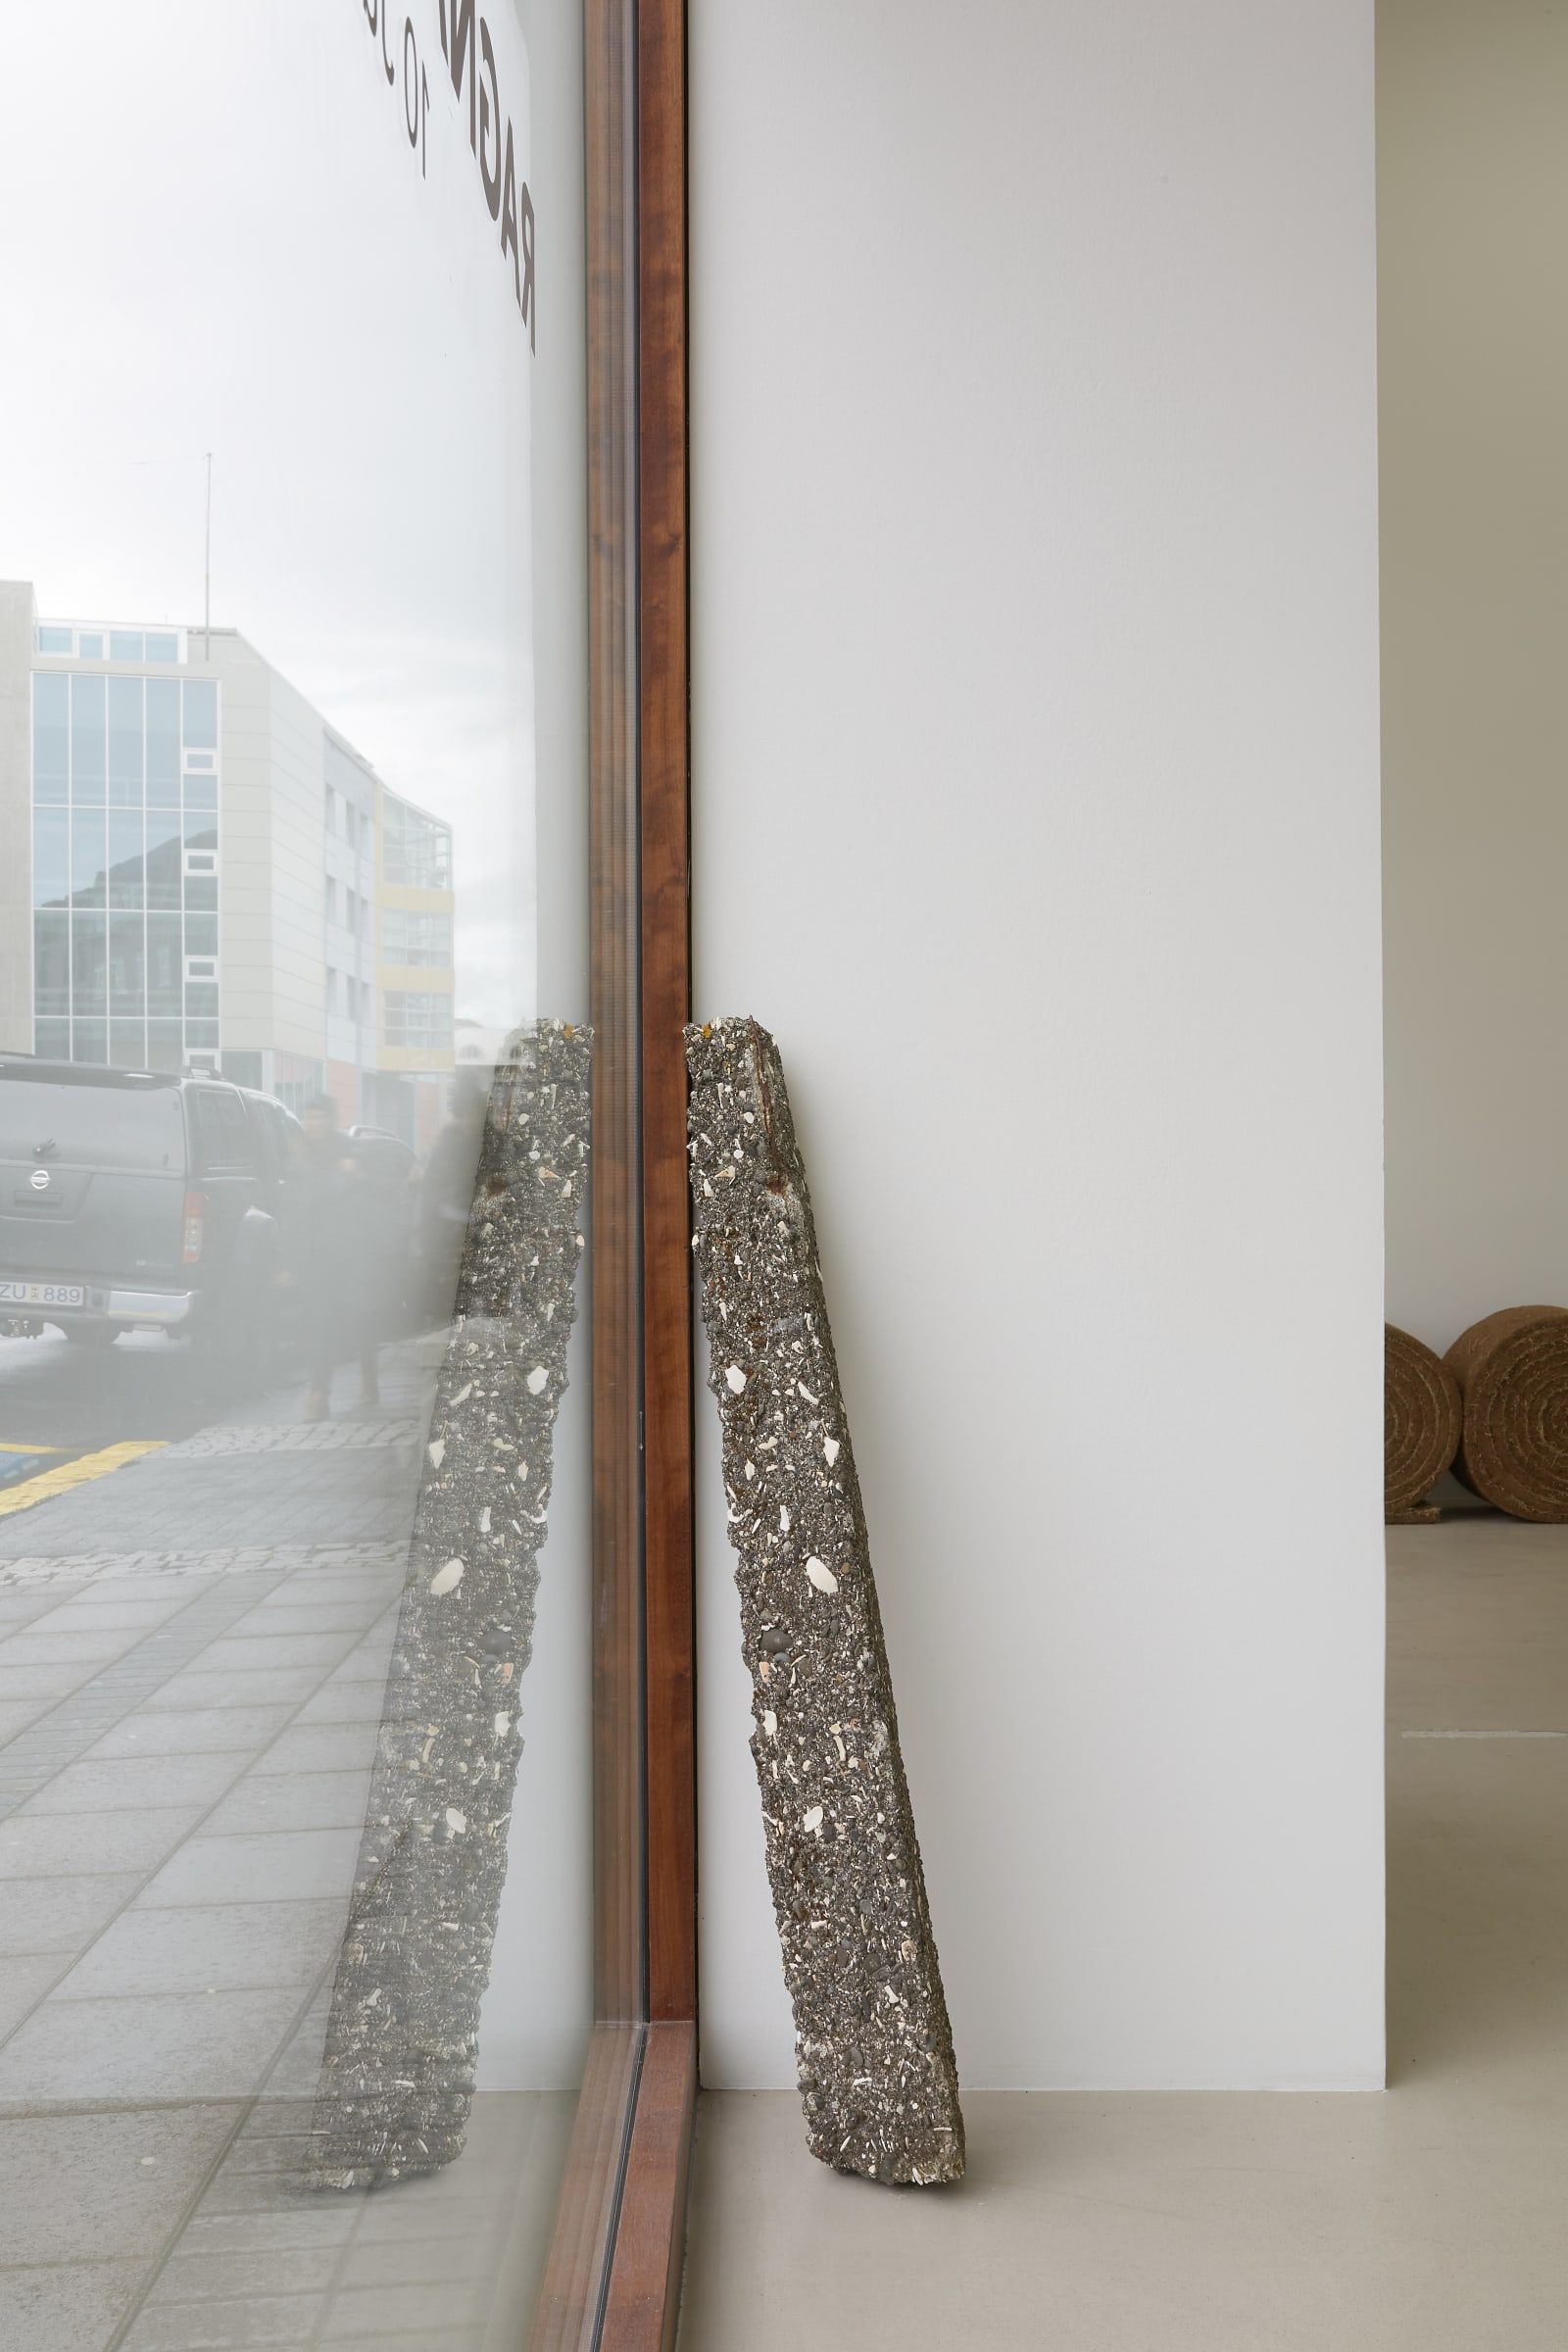 "<span class=""link fancybox-details-link""><a href=""/exhibitions/185/works/artworks17783/"">View Detail Page</a></span><div class=""artist""><strong>RAGNA RÓBERTSDÓTTIR</strong></div><div class=""title""><em>Seascape</em>, 2012</div><div class=""medium"">concrete with sea shells from Arnarfjörður</div><div class=""dimensions"">118 x 18 x 14 cm<br>46 1/2 x 7 1/8 x 5 1/2 in</div>"